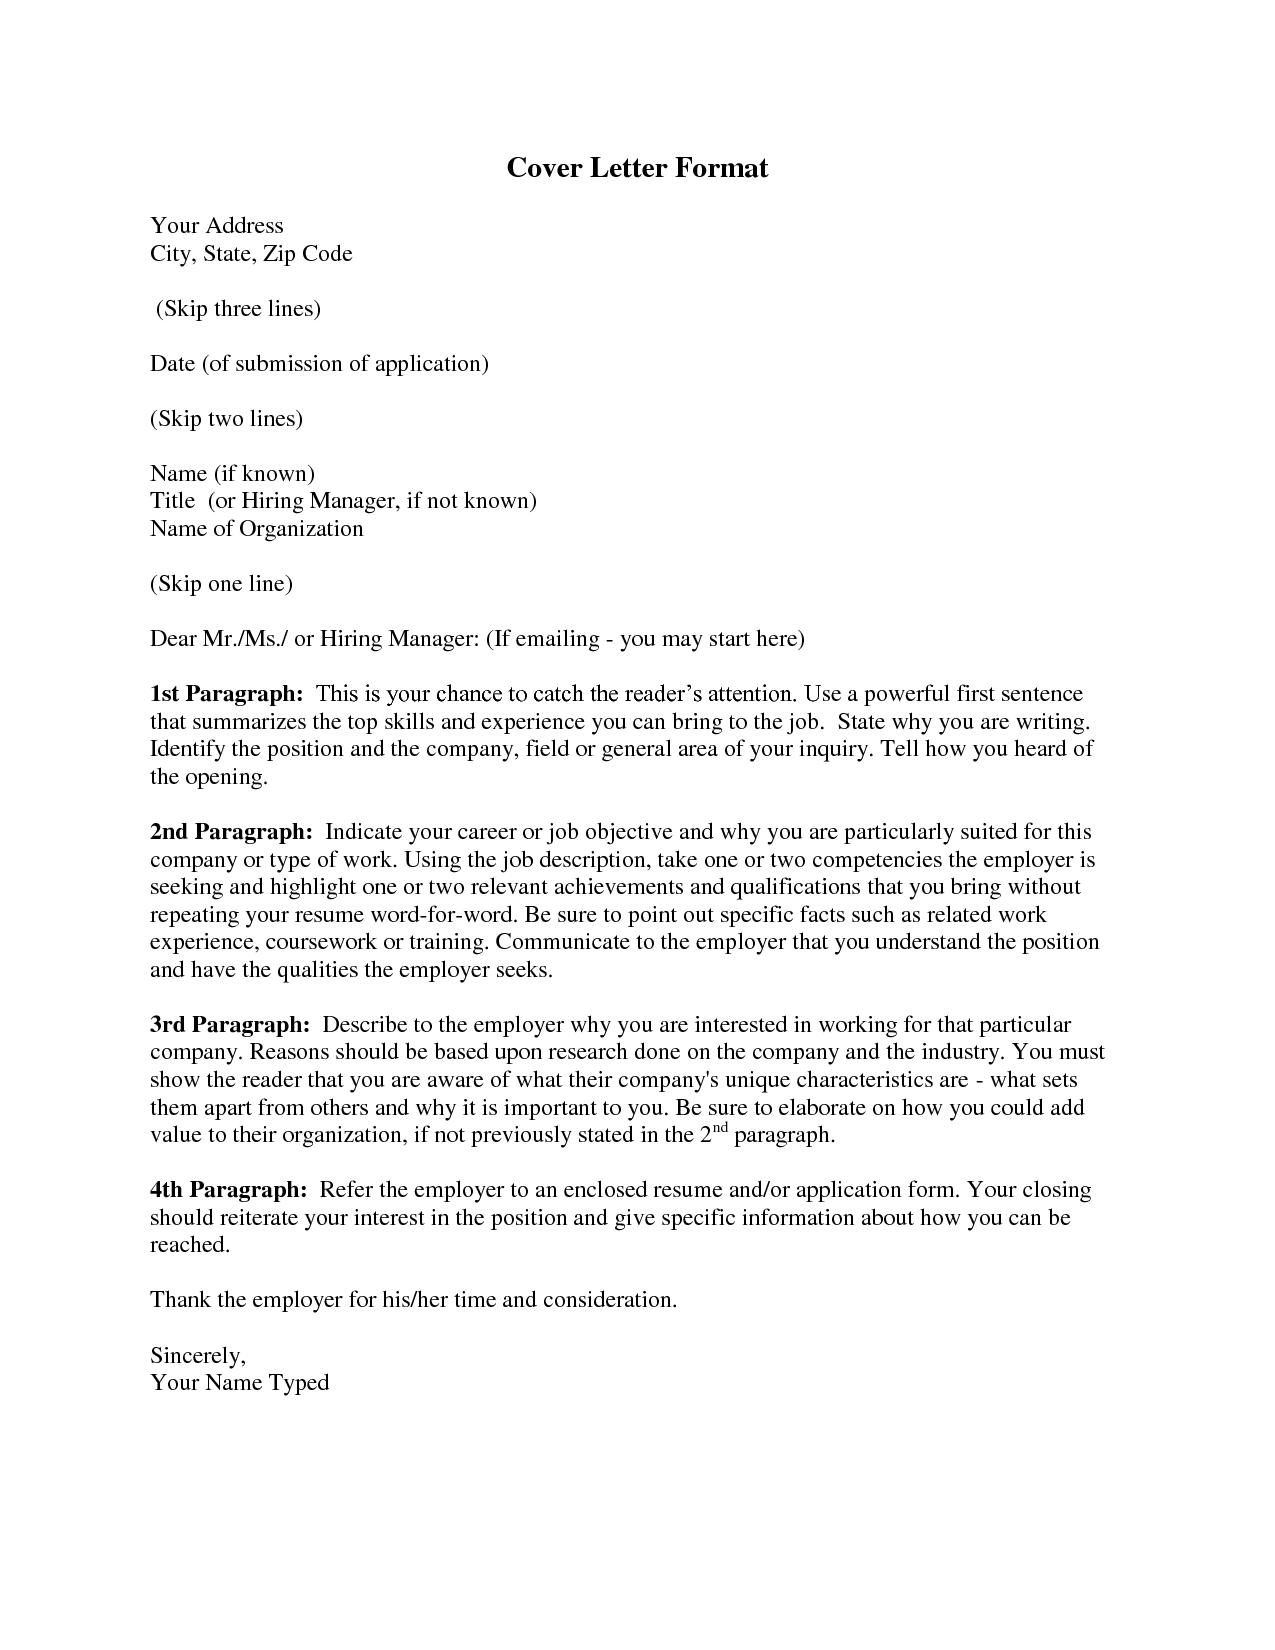 iagora cover letter